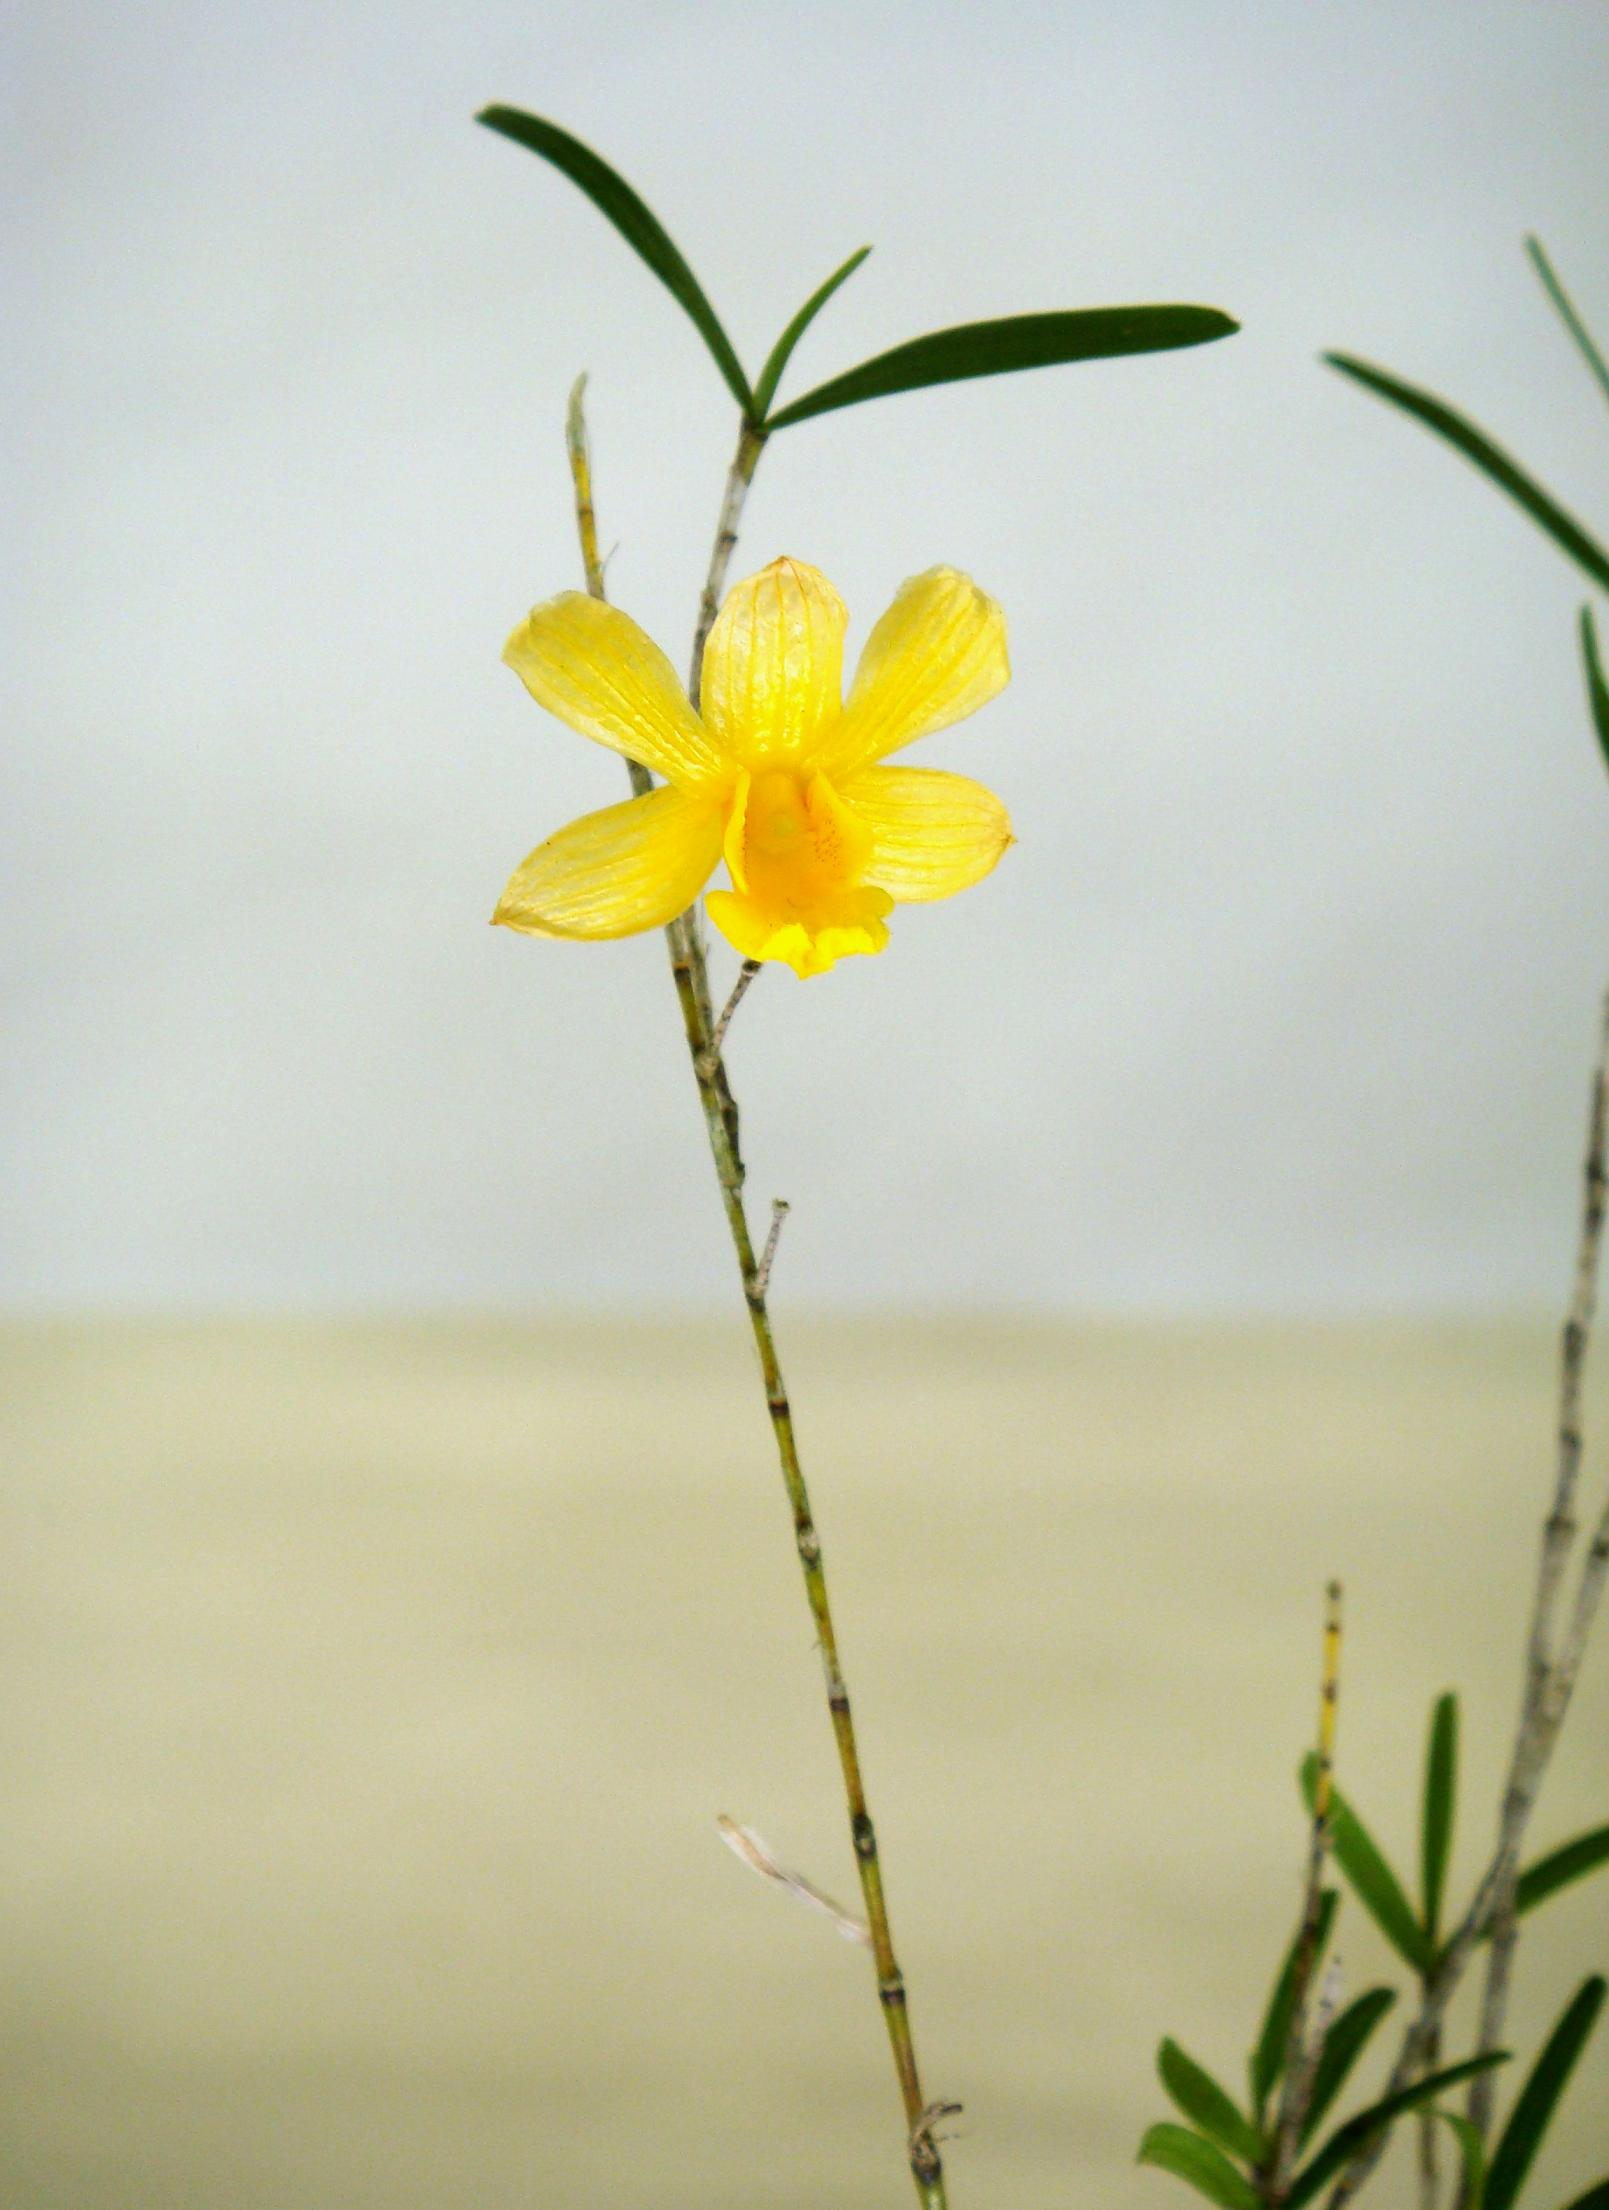 http://orchids.la.coocan.jp/Dendrobium/Dendrobium%20hancockii/DSC00013.JPG